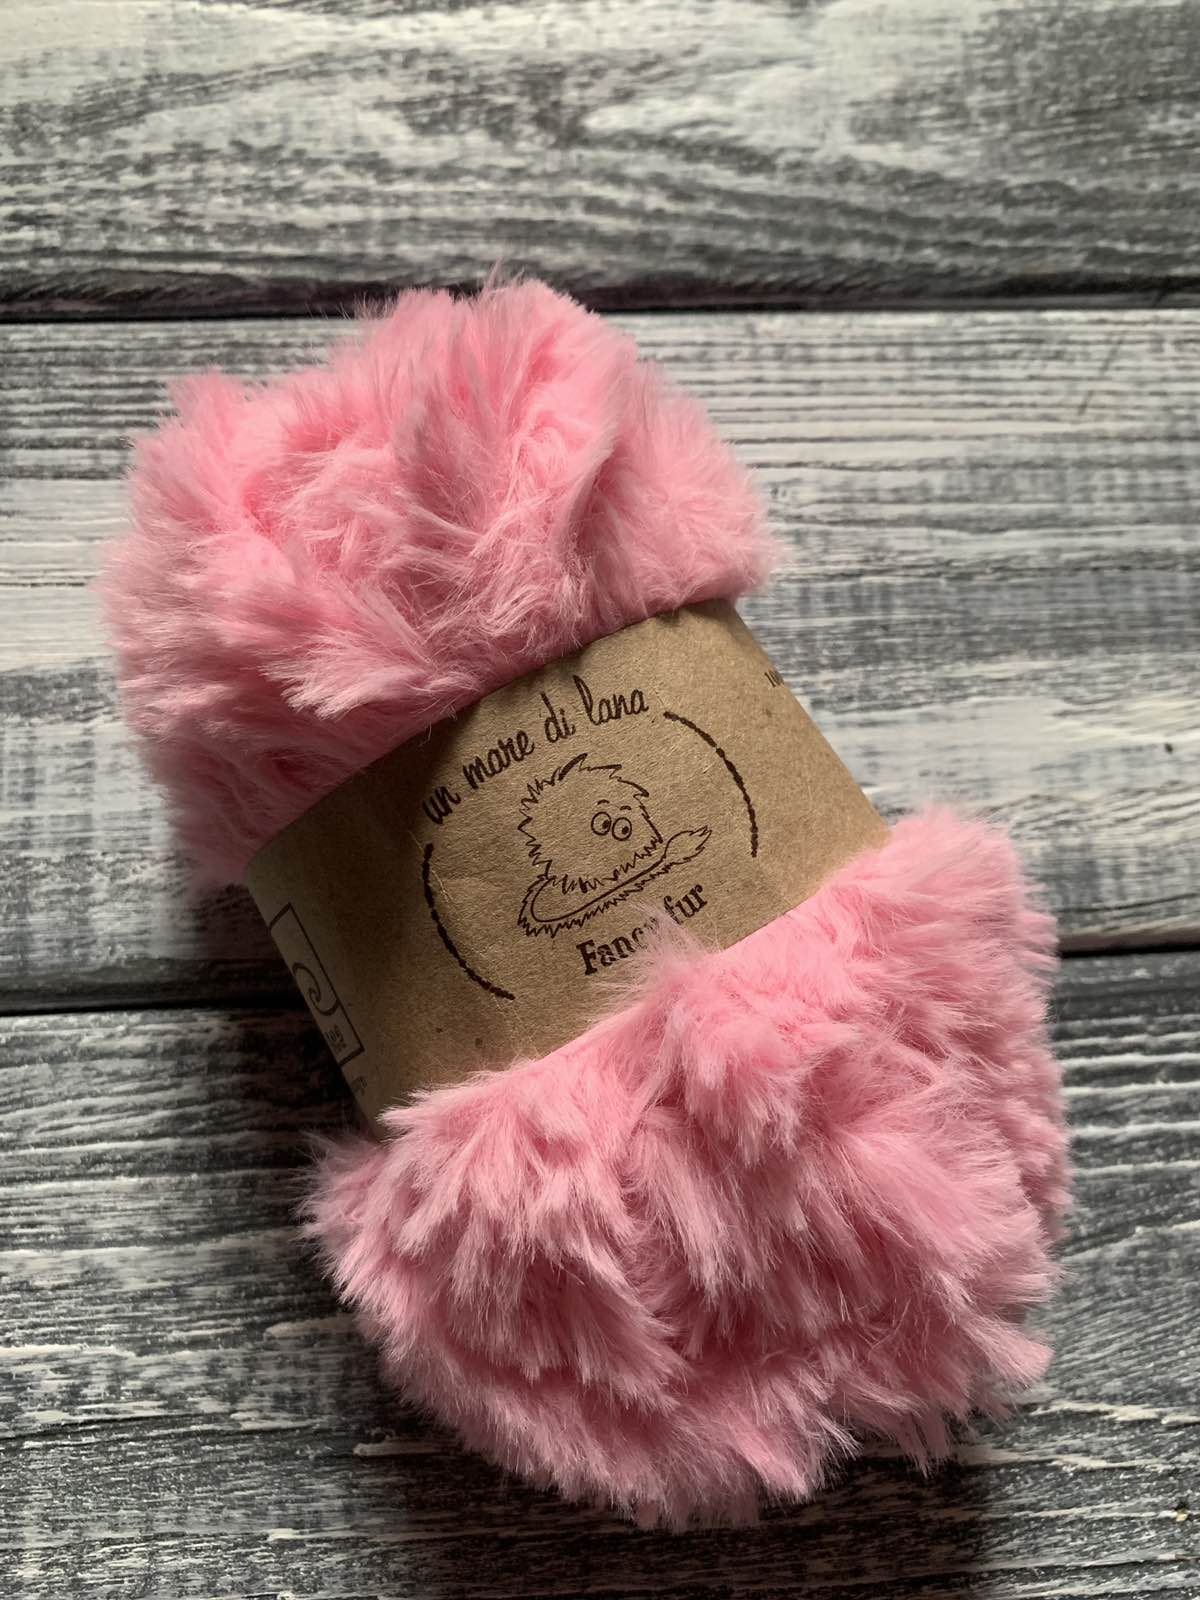 Wool Sea Fancy fur (Море шерсти Фанси фе ) 163 - миндаль купить в Минске со скидкой